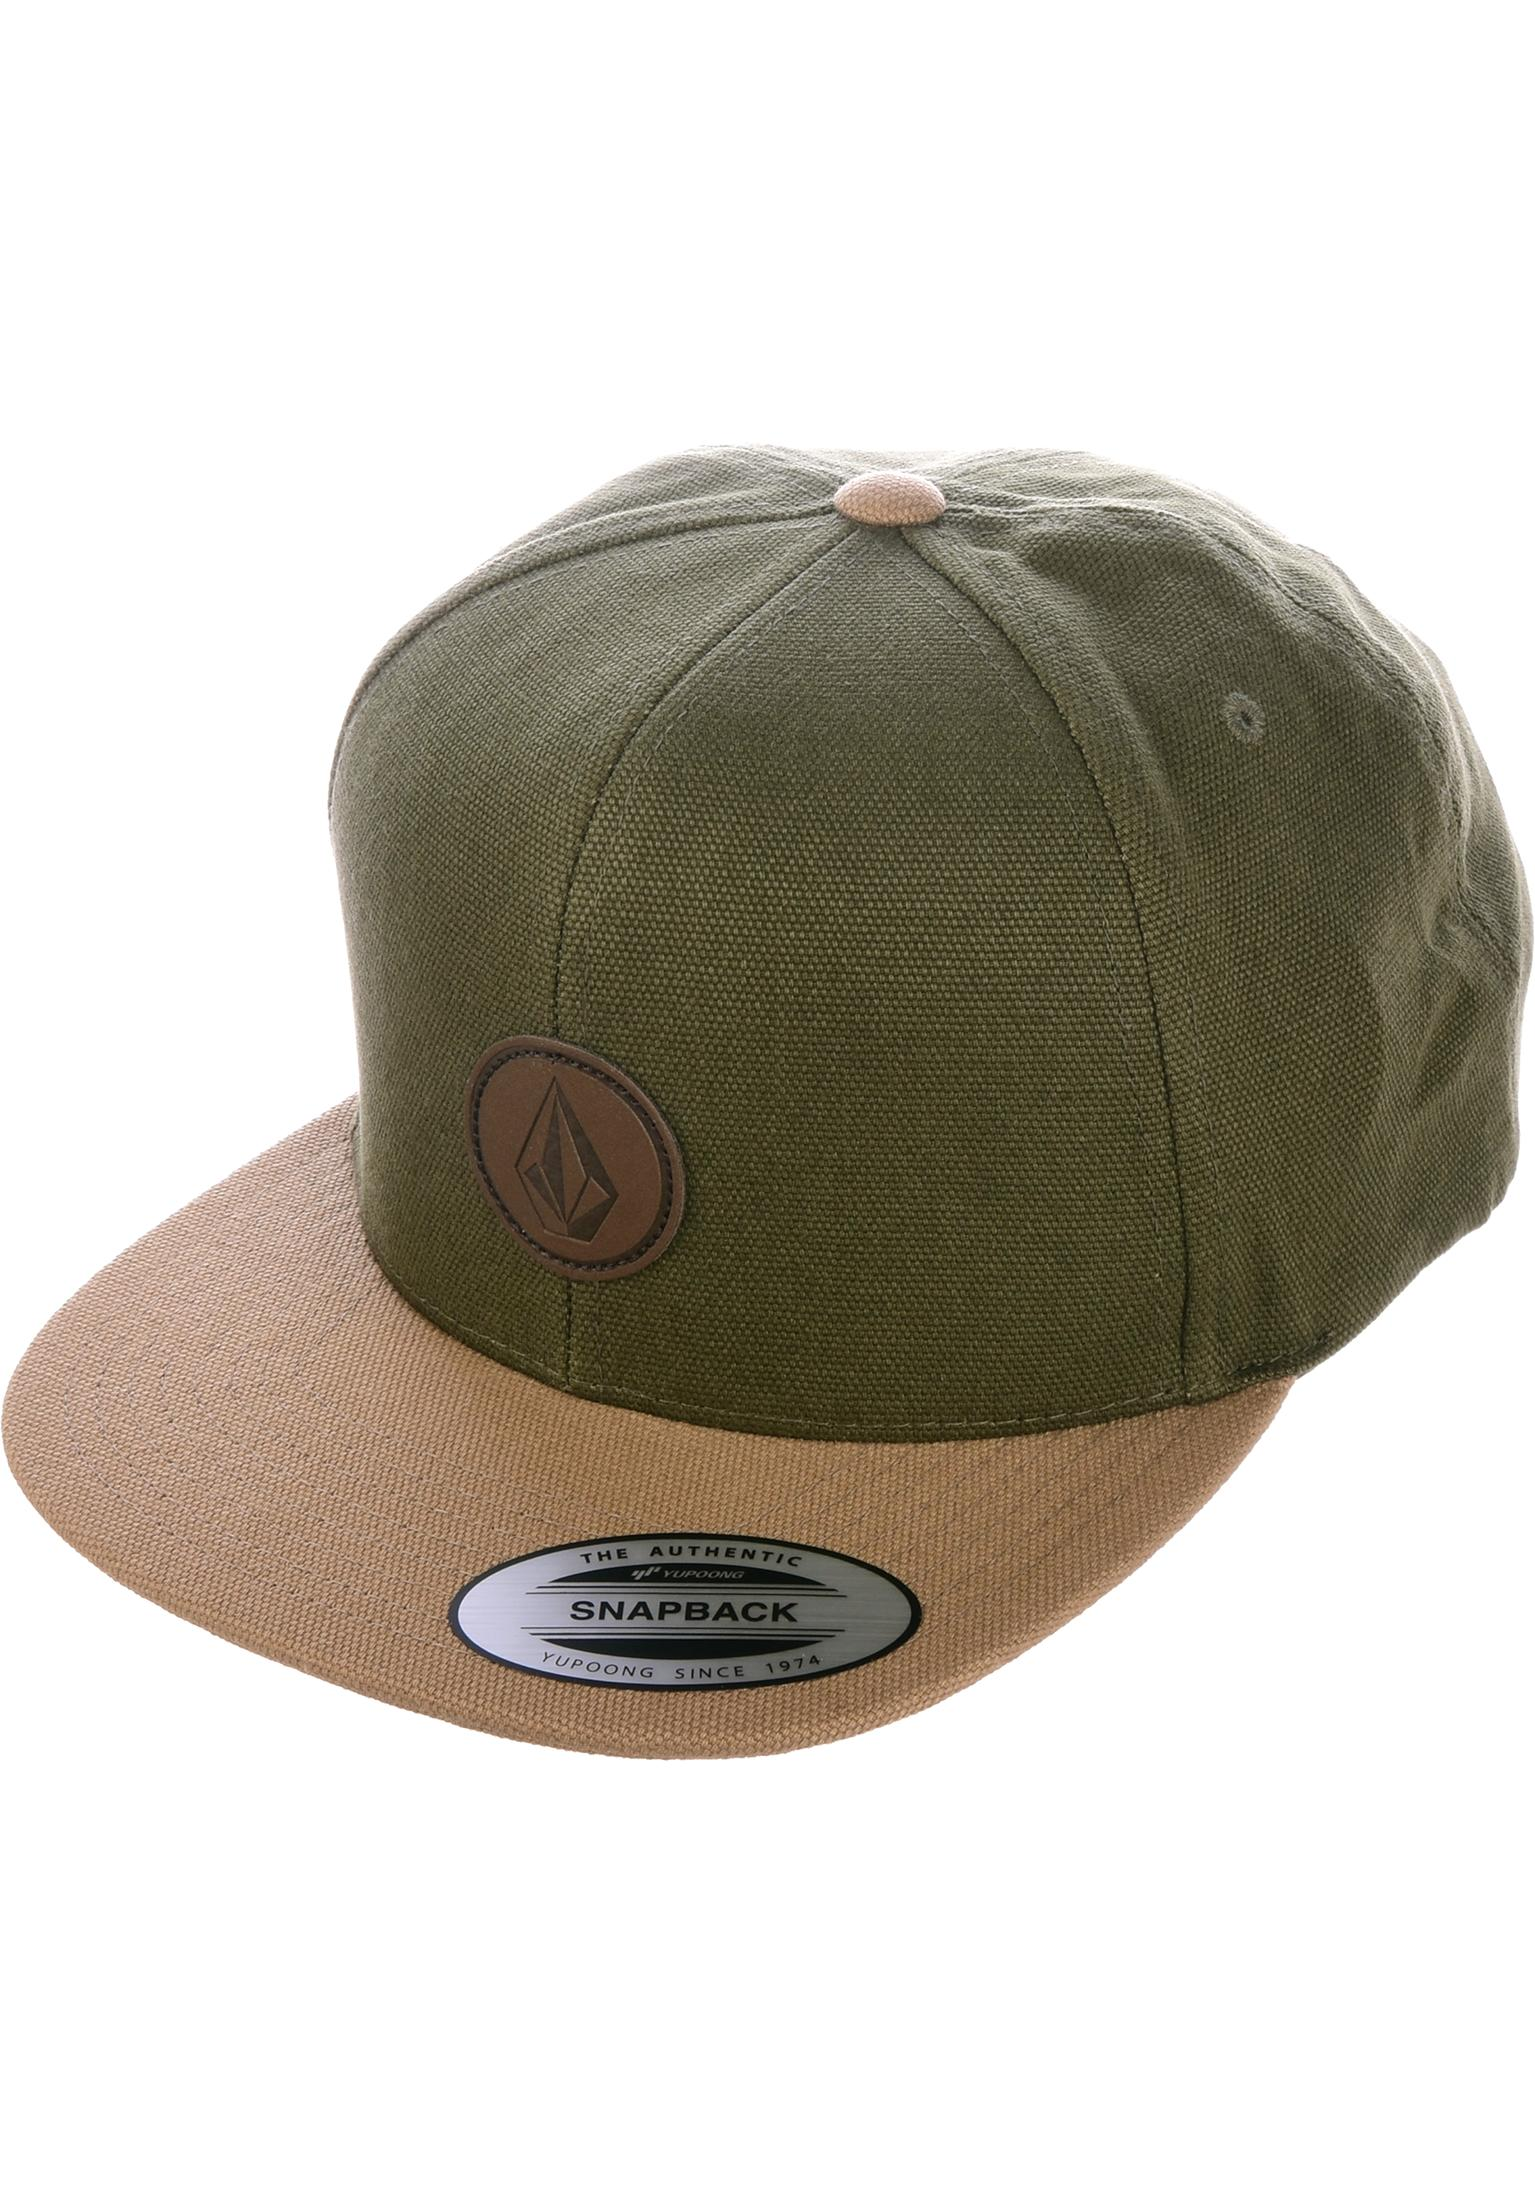 sale retailer c8657 0cb5f ... discount code for quarter fabric volcom caps in army for men titus  3b8eb 1a423